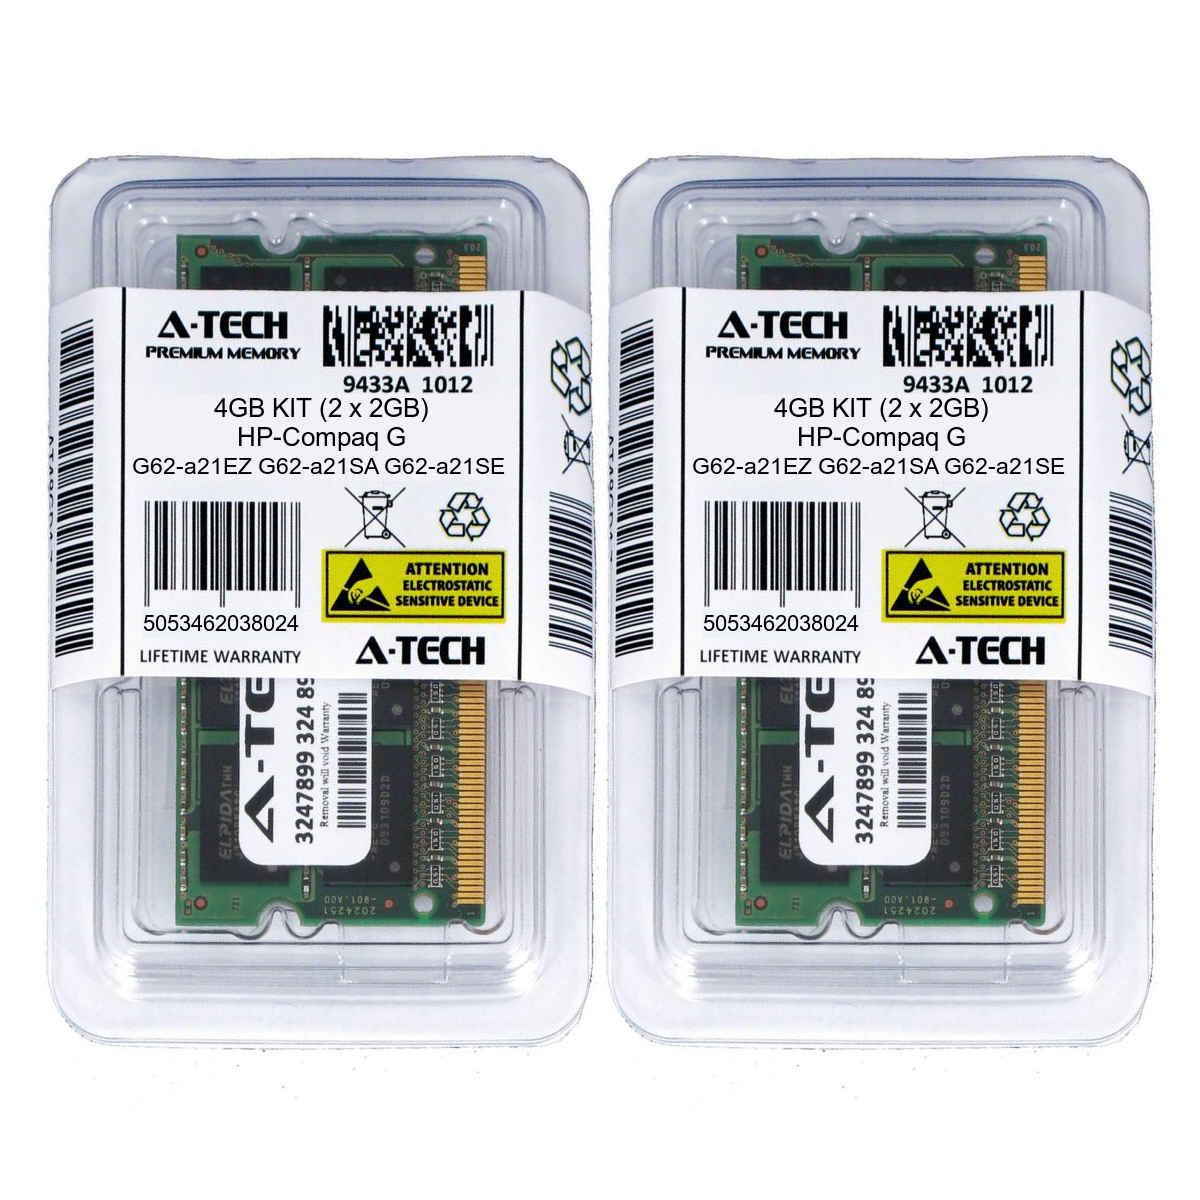 4GB KIT 2 x 2GB HP Compaq G71-448CL G71-449WM G71t G72 G72-214CA Ram Memory